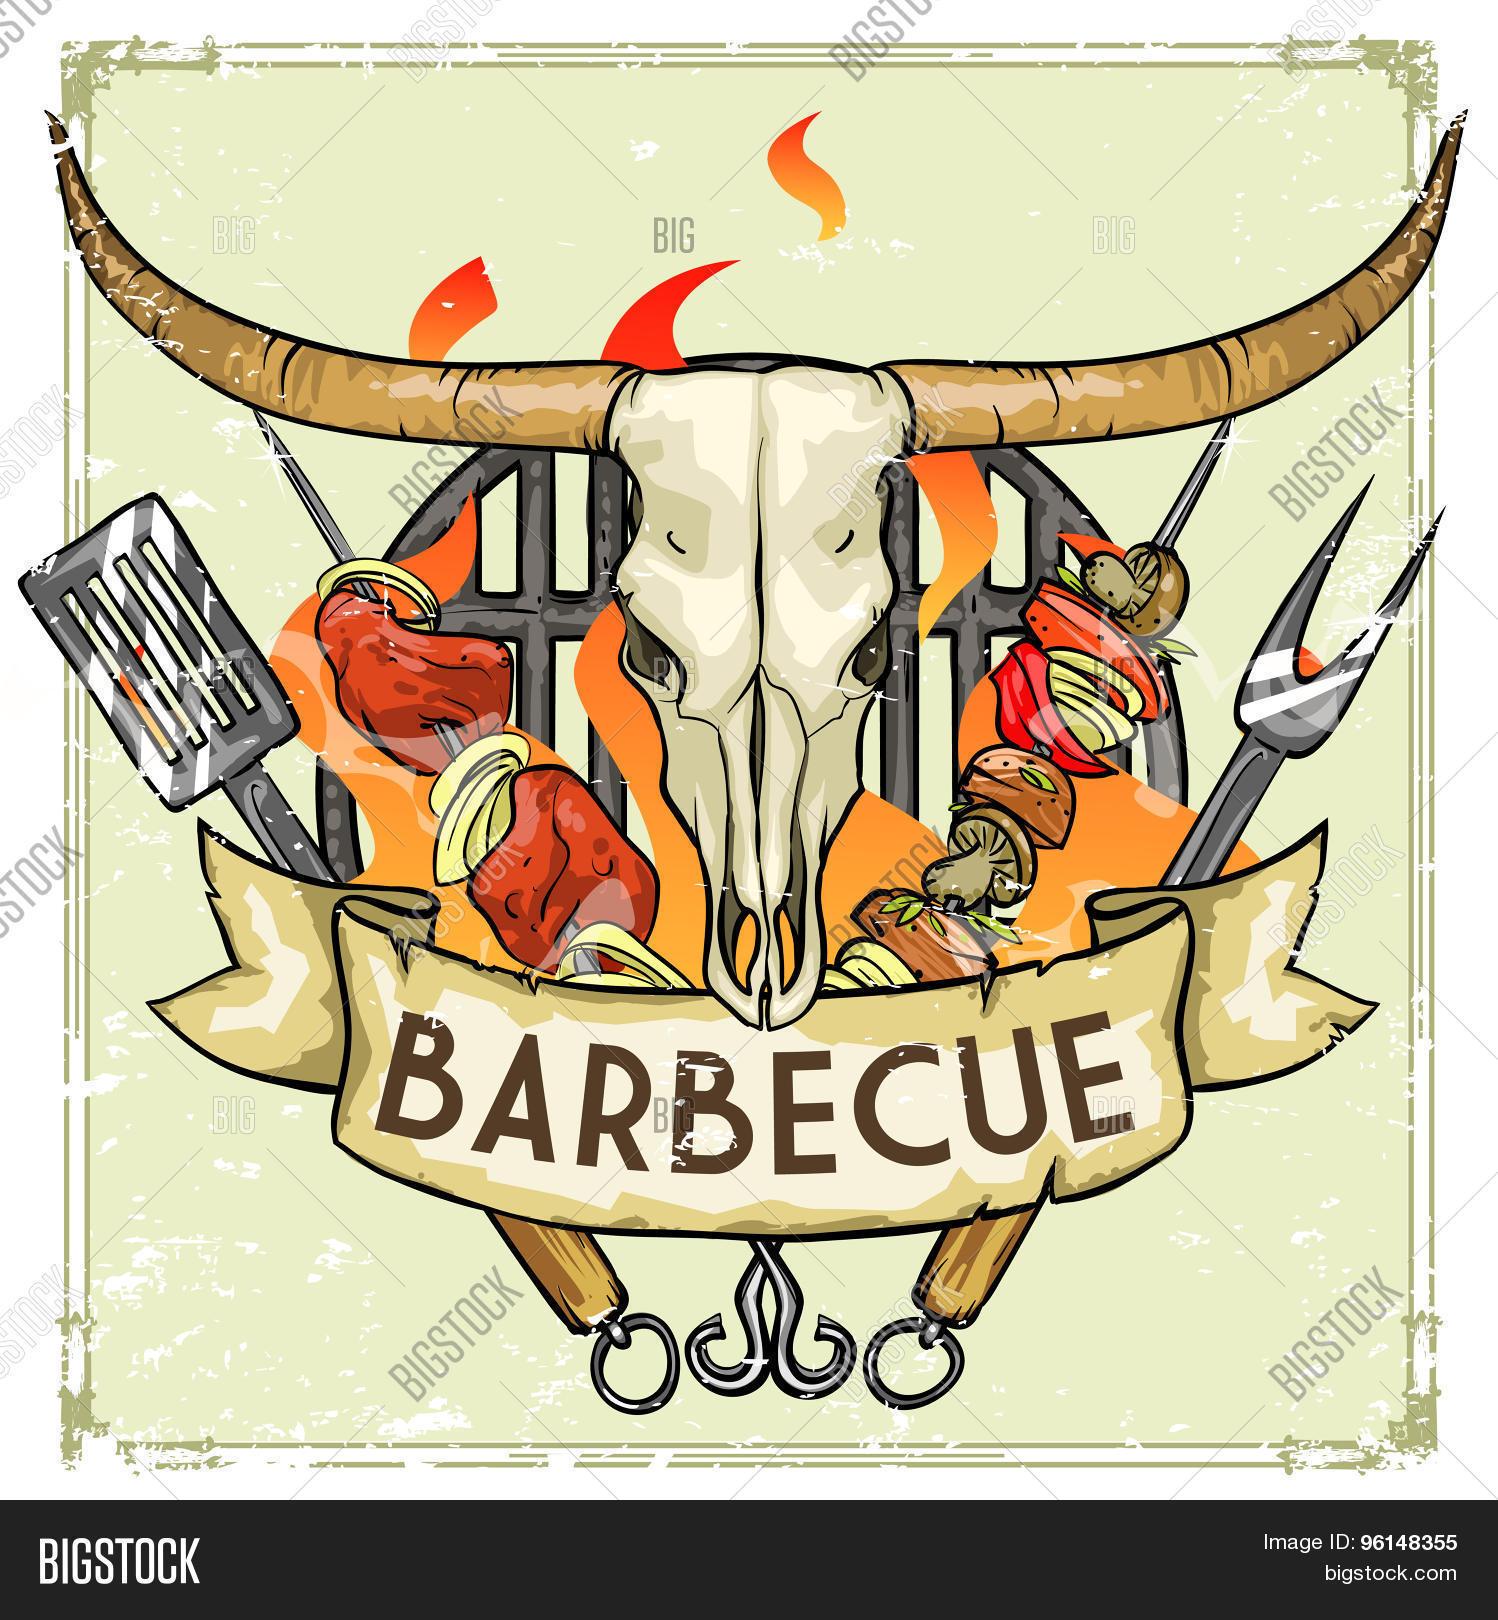 BBQ Grill Label Vector & Photo (Free Trial) | Bigstock